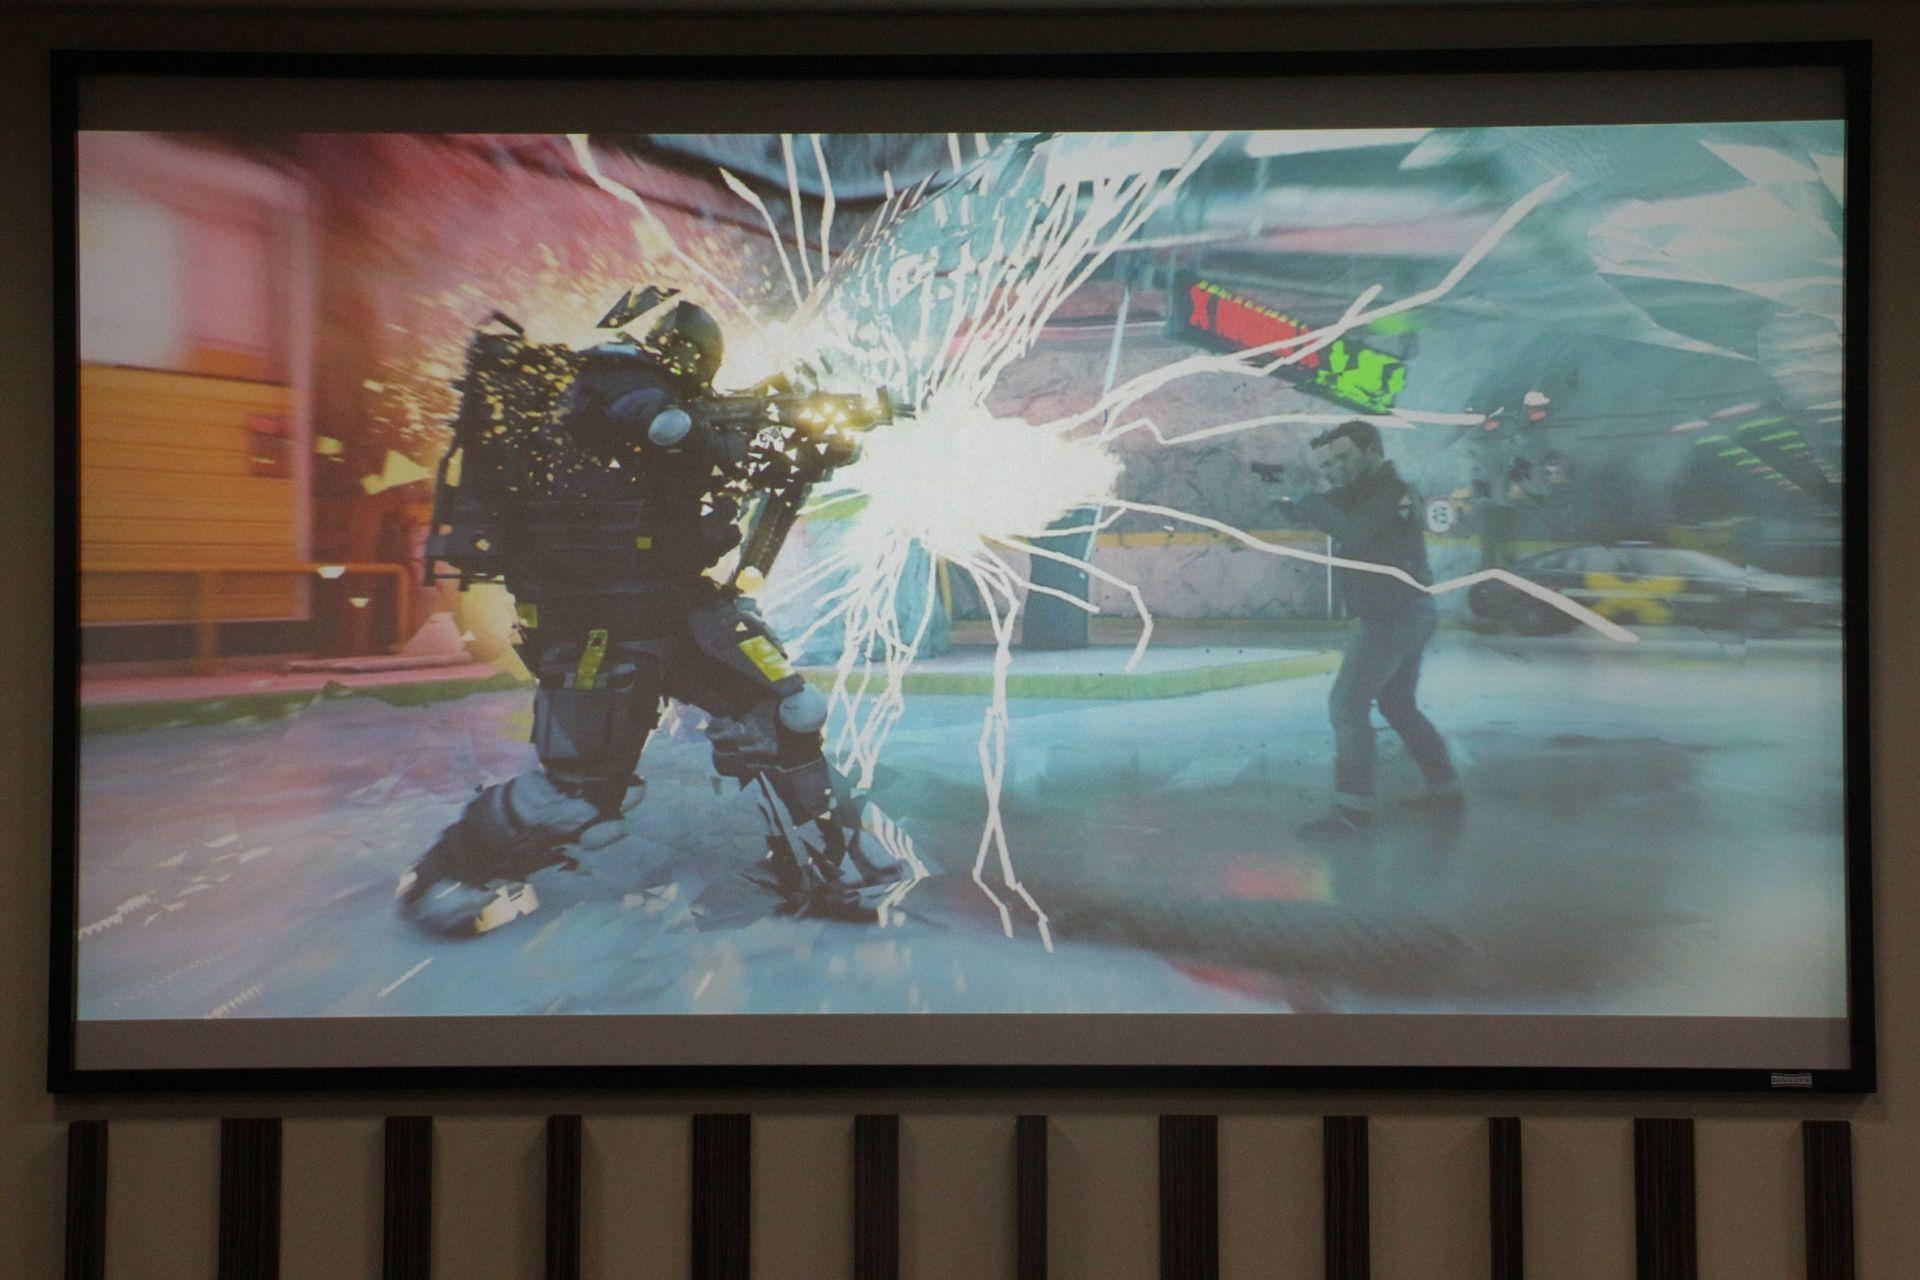 DirectX 12ベースで、美しいグラフィックスと高いパフォーマンスを両立させている「Quantum Break」